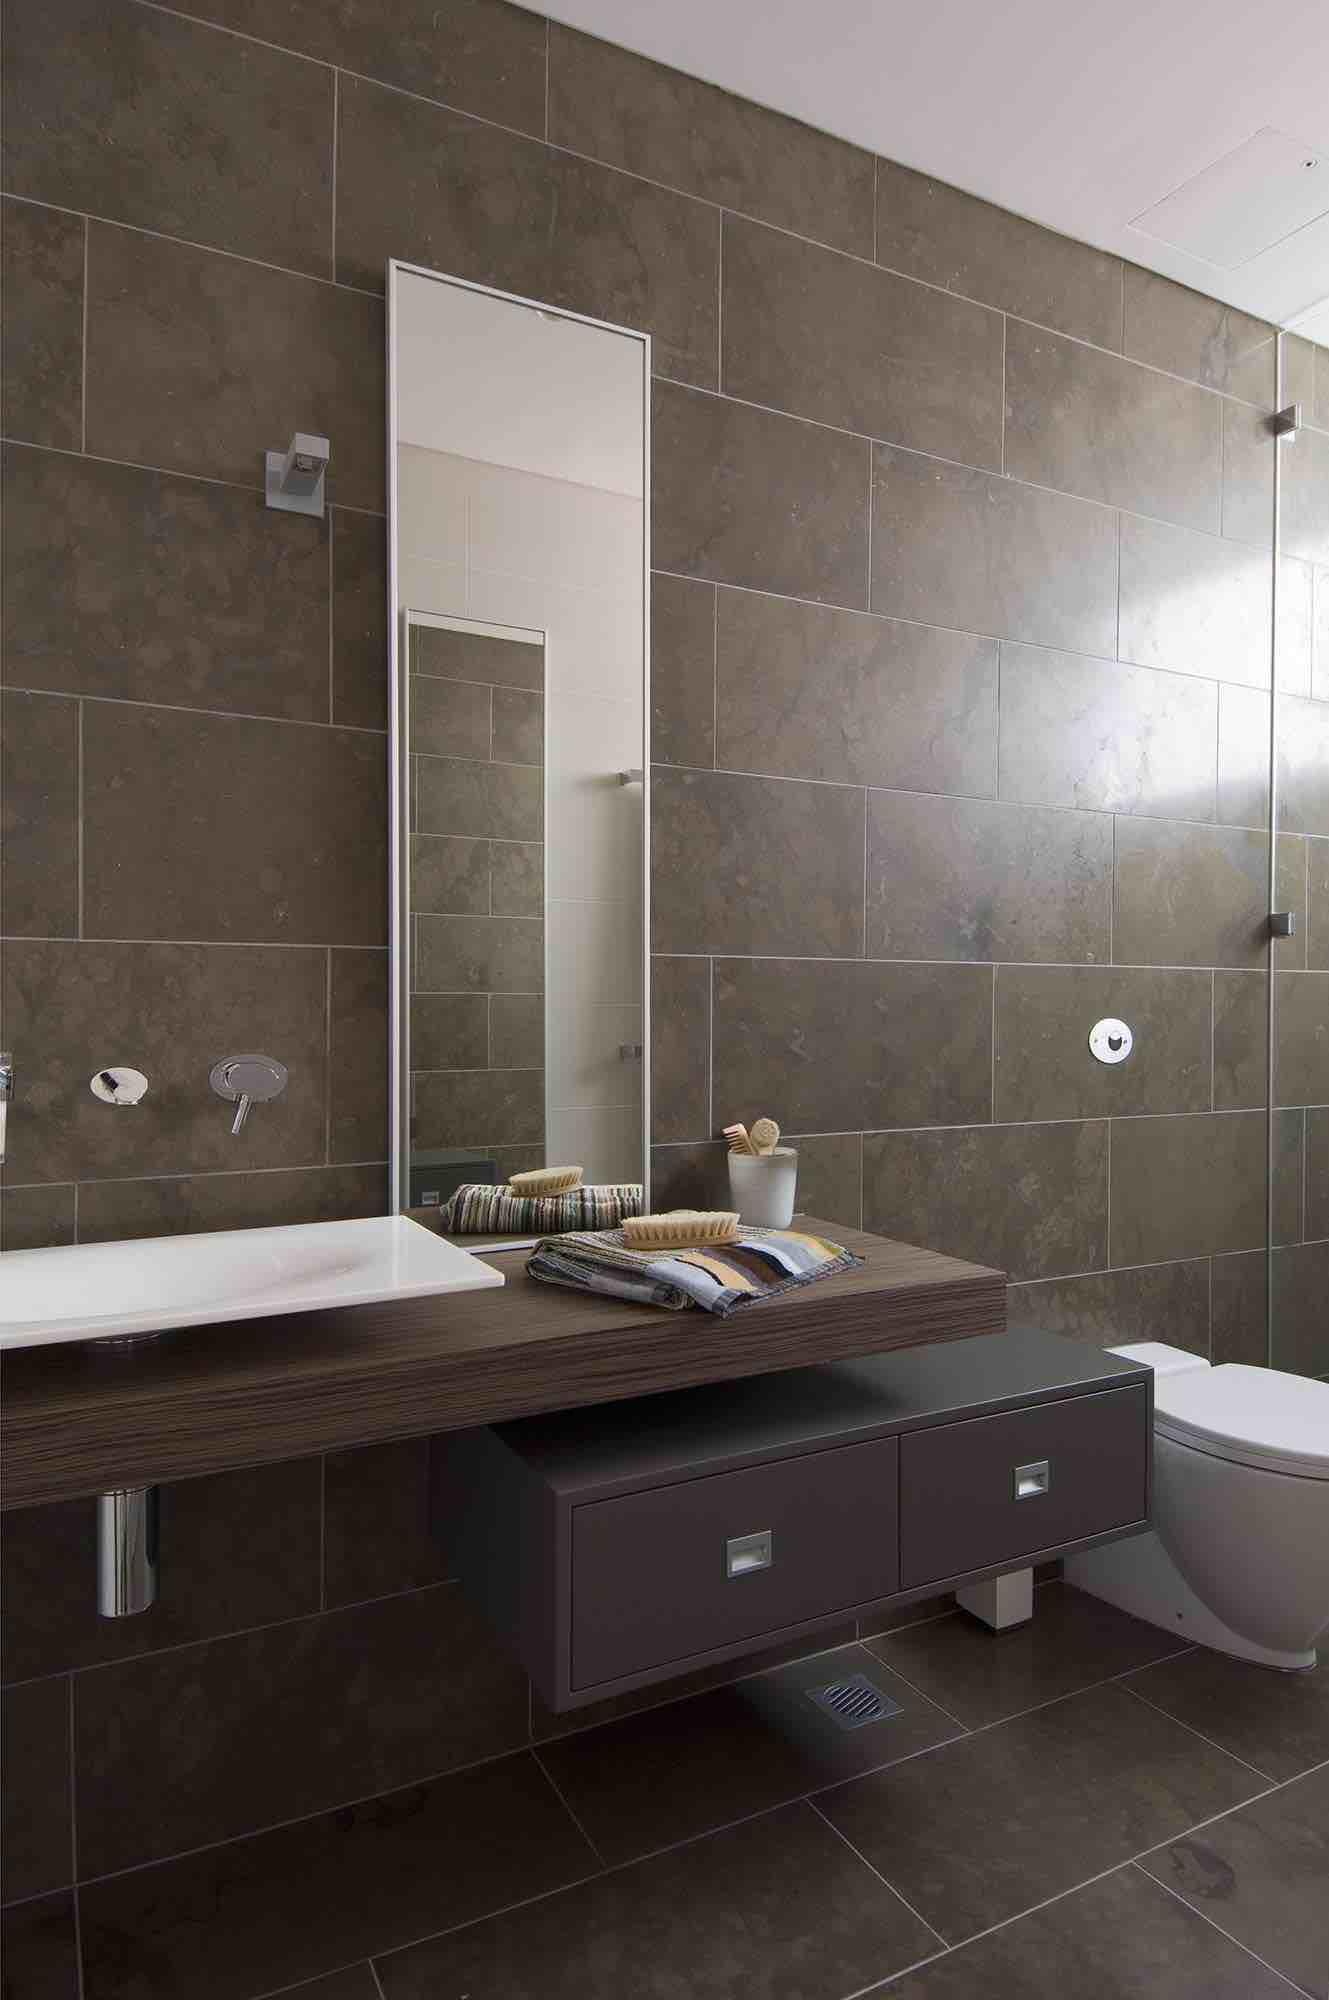 minosa-design-modern-bathroom-floating-vanity-portlans-st-bathroom-scoop-corian-basin-gessi-ovale-dover-heights-04